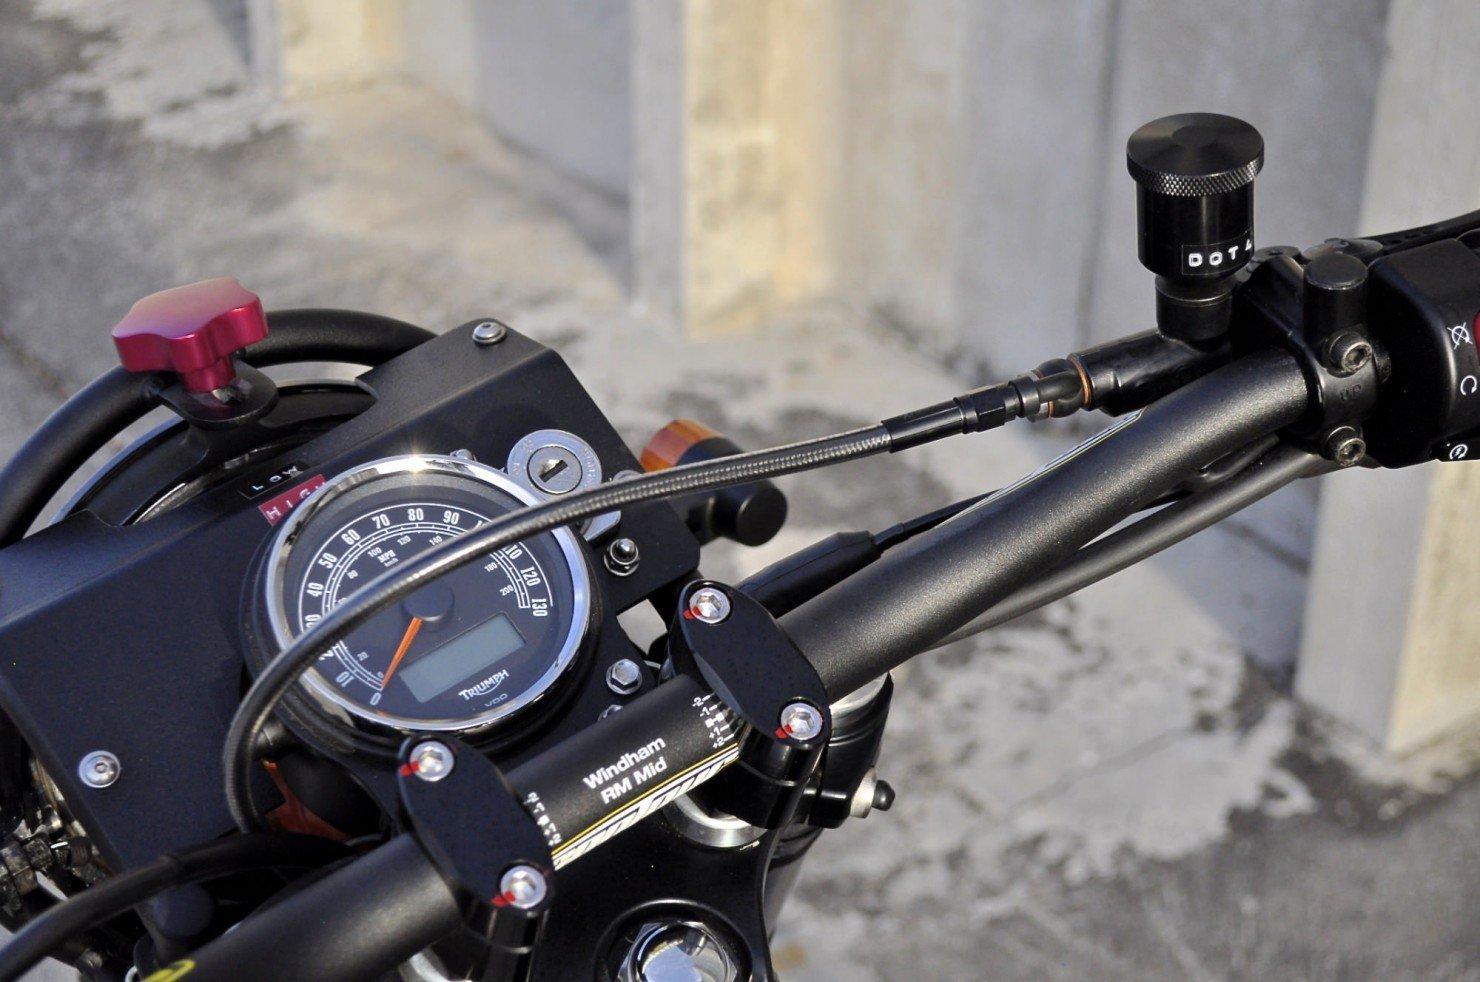 triumph_enduro_motorcycle_12